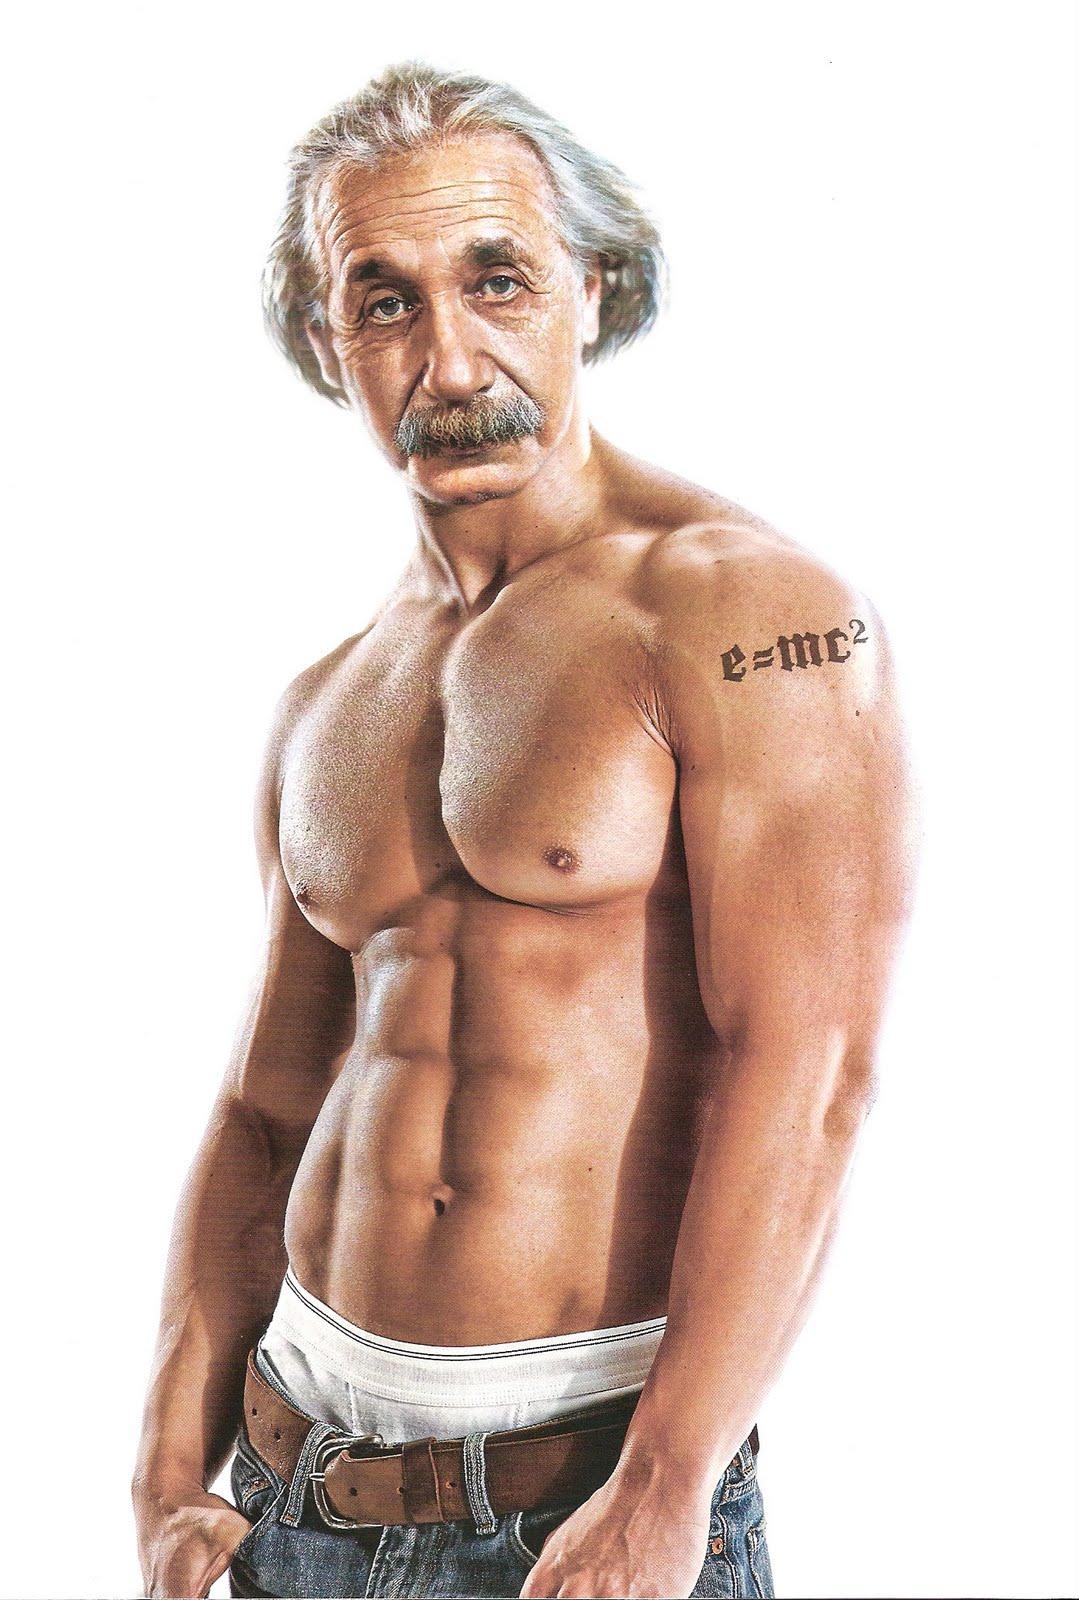 http://2.bp.blogspot.com/_vs69endjRuc/Swt6eMc0n9I/AAAAAAAAAzM/5xtH6Miwp18/s1600/Einstein.jpg